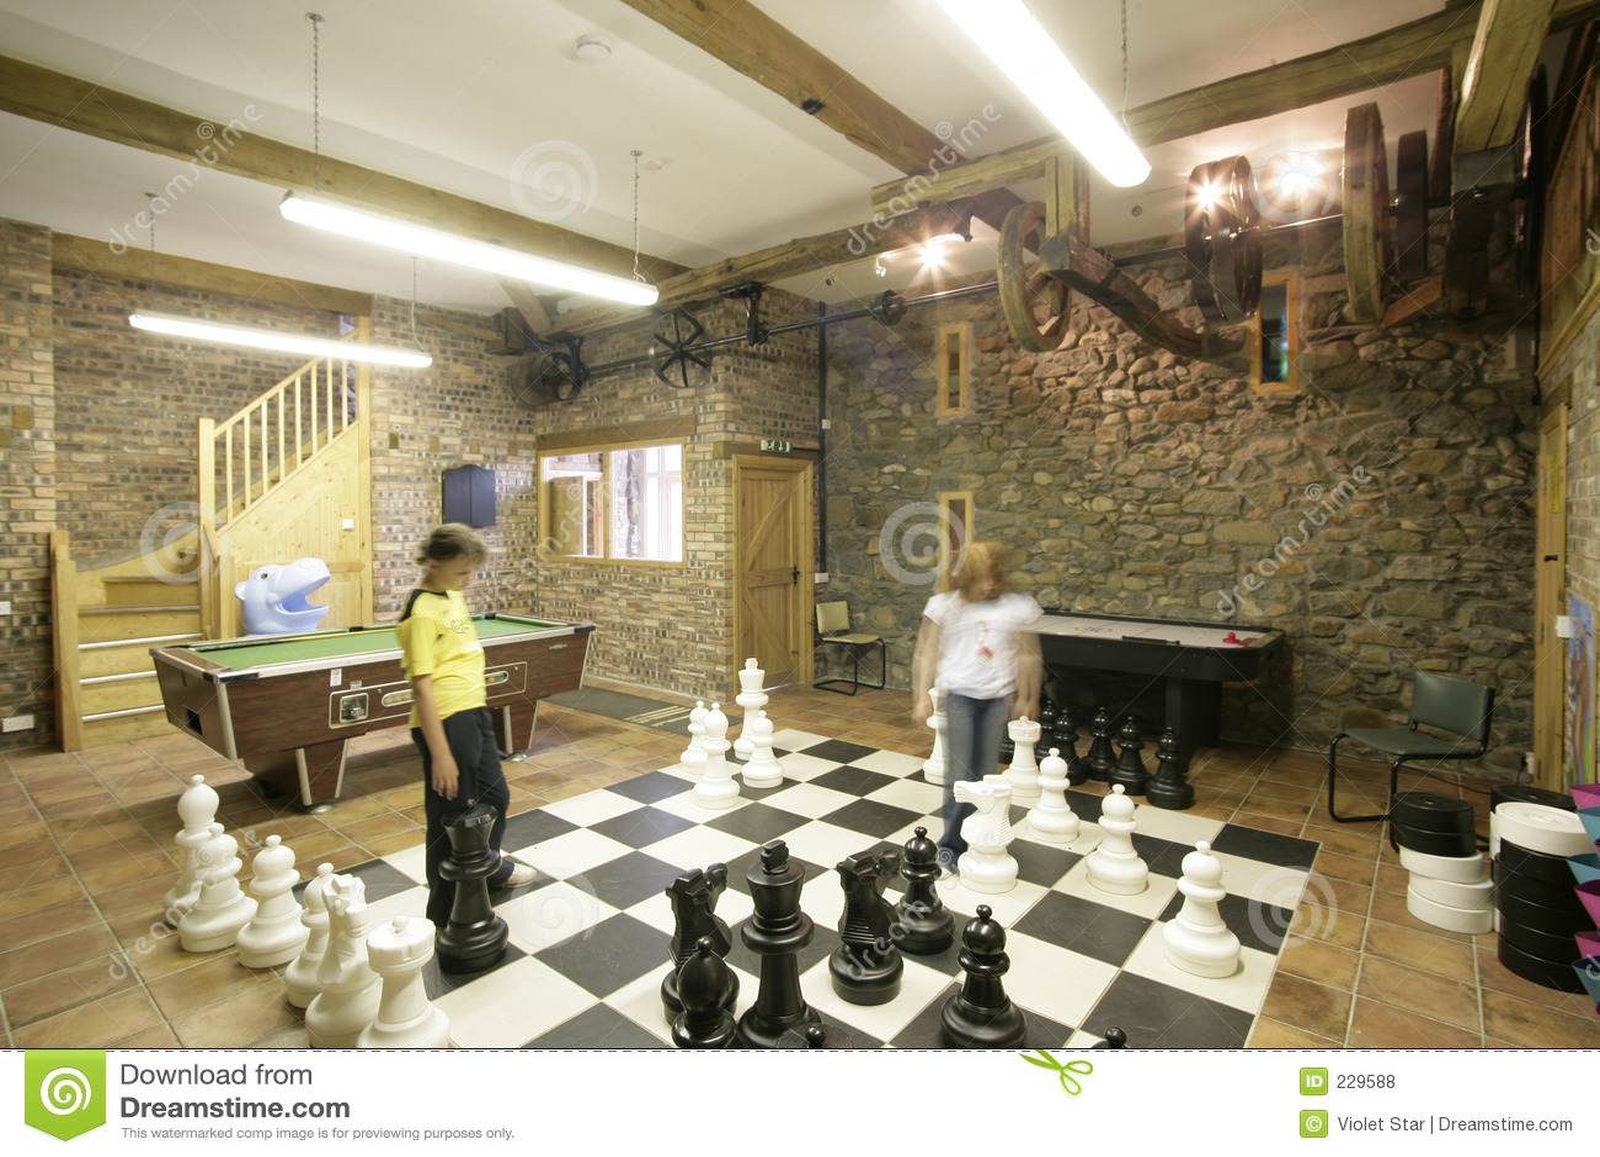 Chess Royalty Free Stock Photos Image 229588